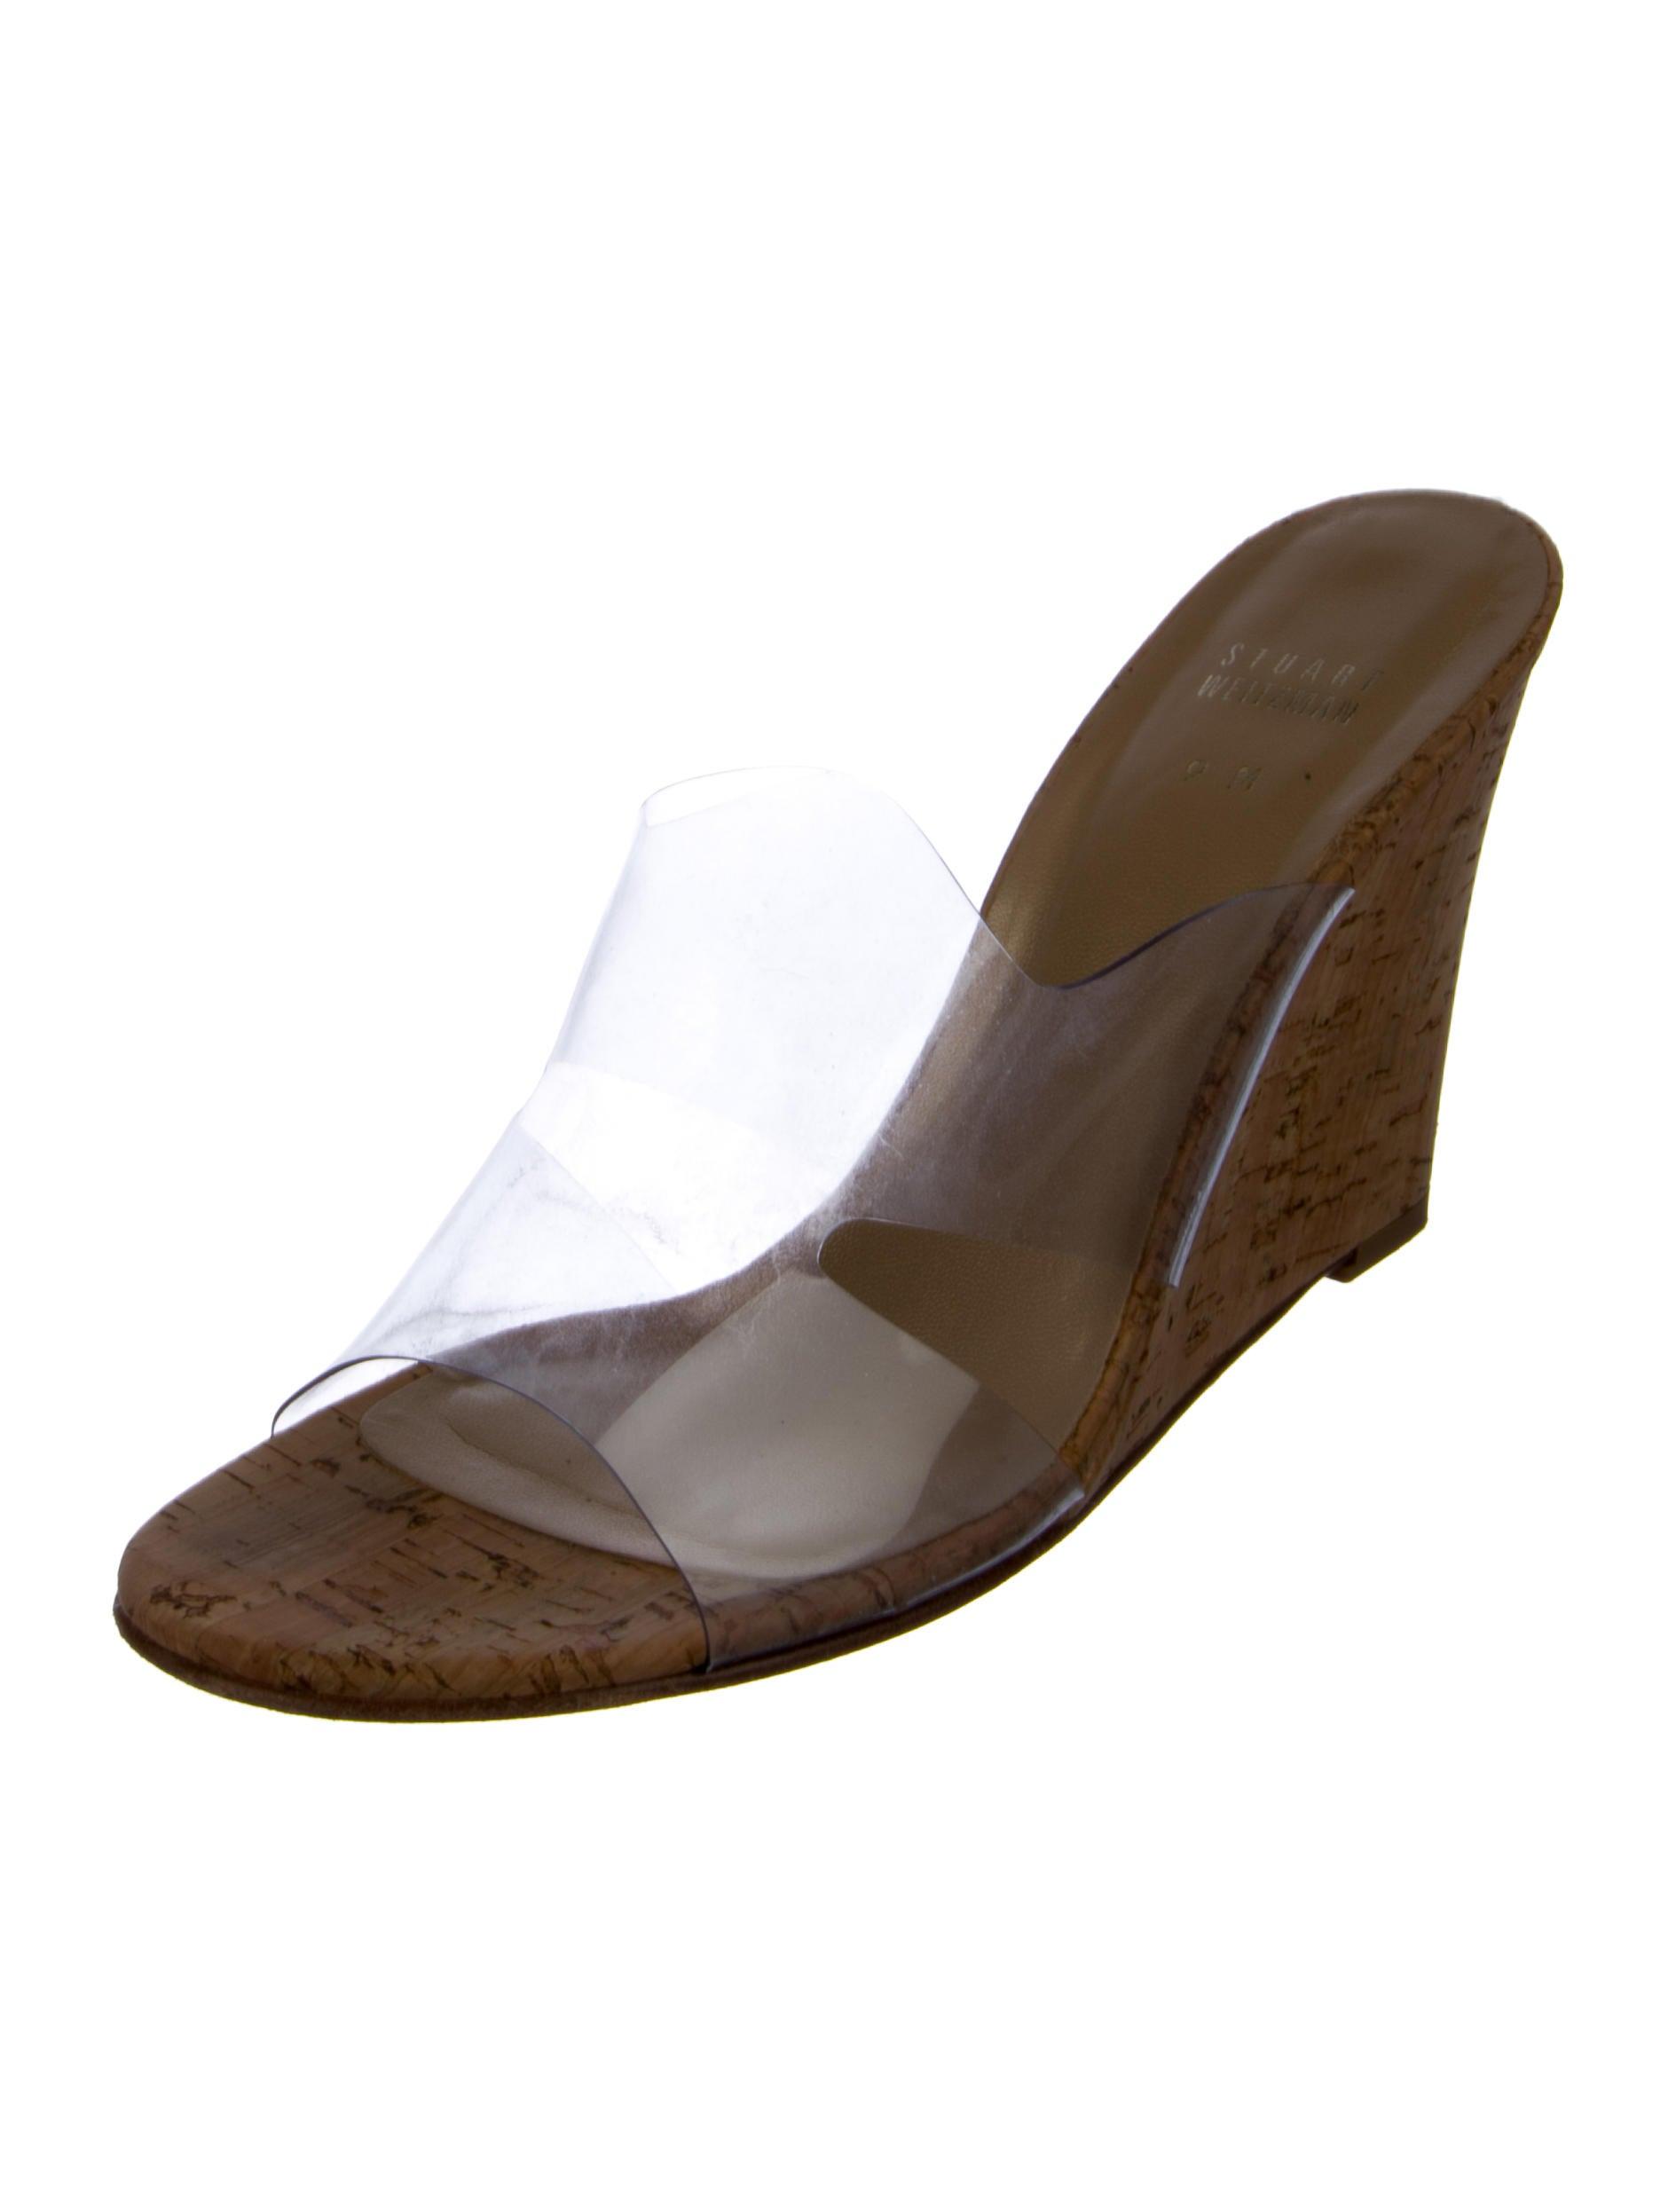 buy cheap price Stuart Weitzman Cutout PVC Wedge Sandals clearance cheap online discount popular nu3kAFc5jm